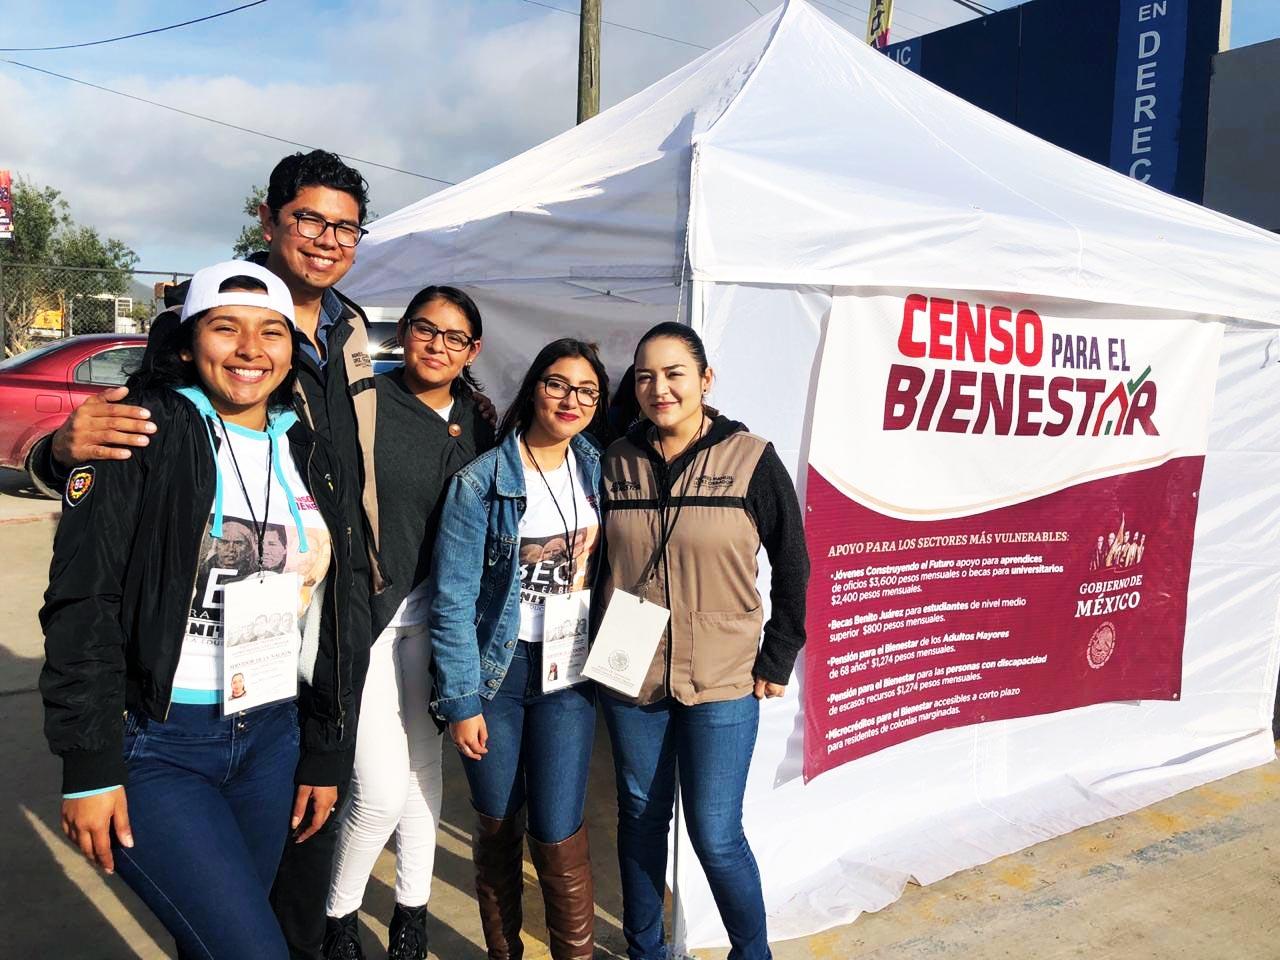 Invitan A Jóvenes De Tijuana A Inscribirse A Programa Social